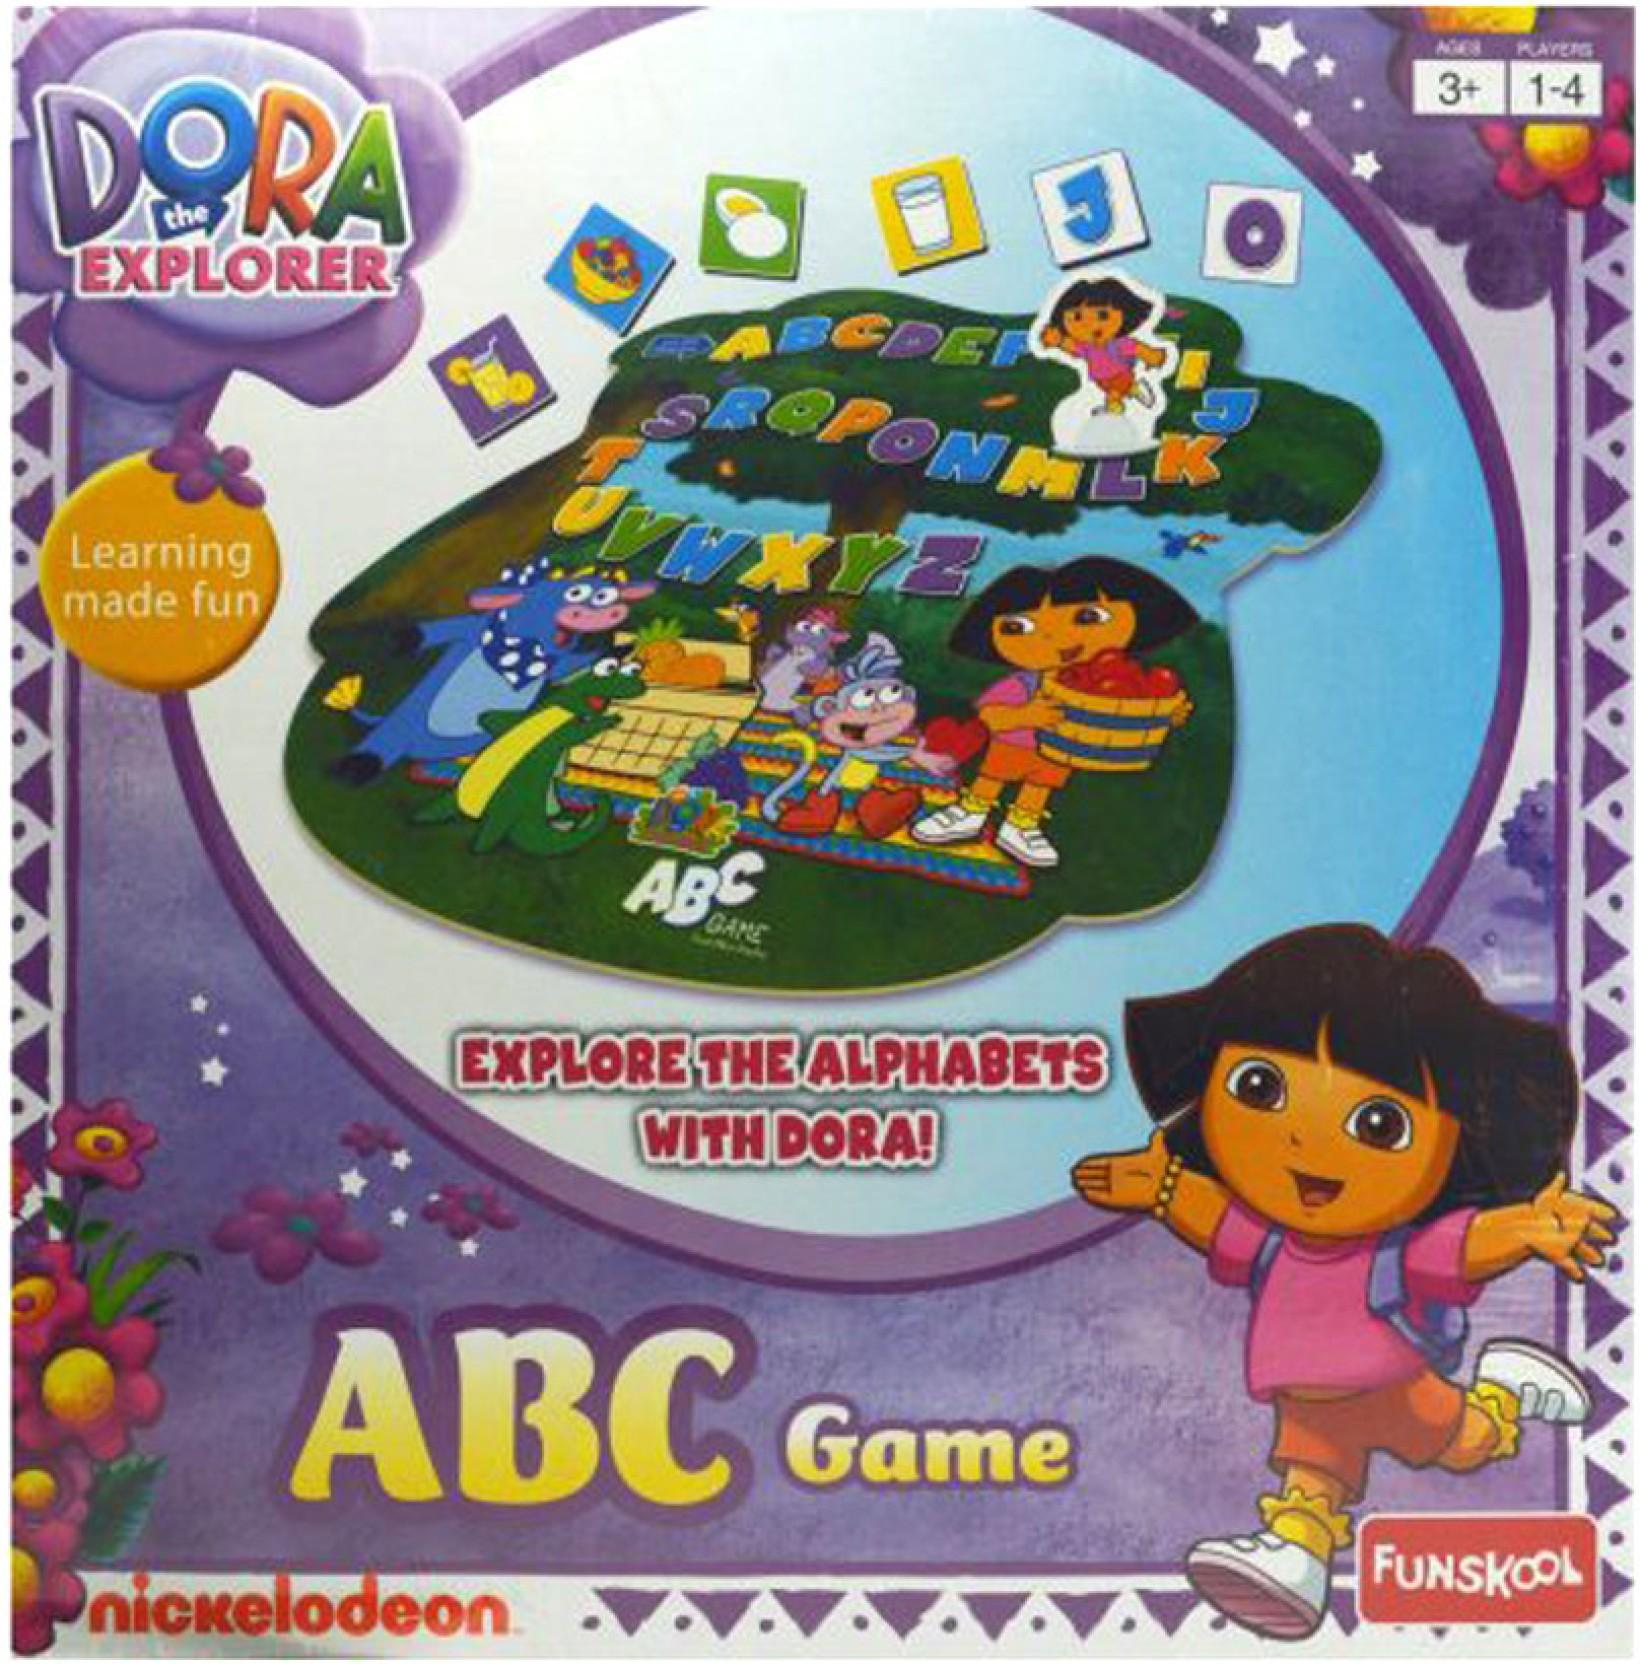 Funskool Dora the Explorer ABC Game Educational Game for Kids